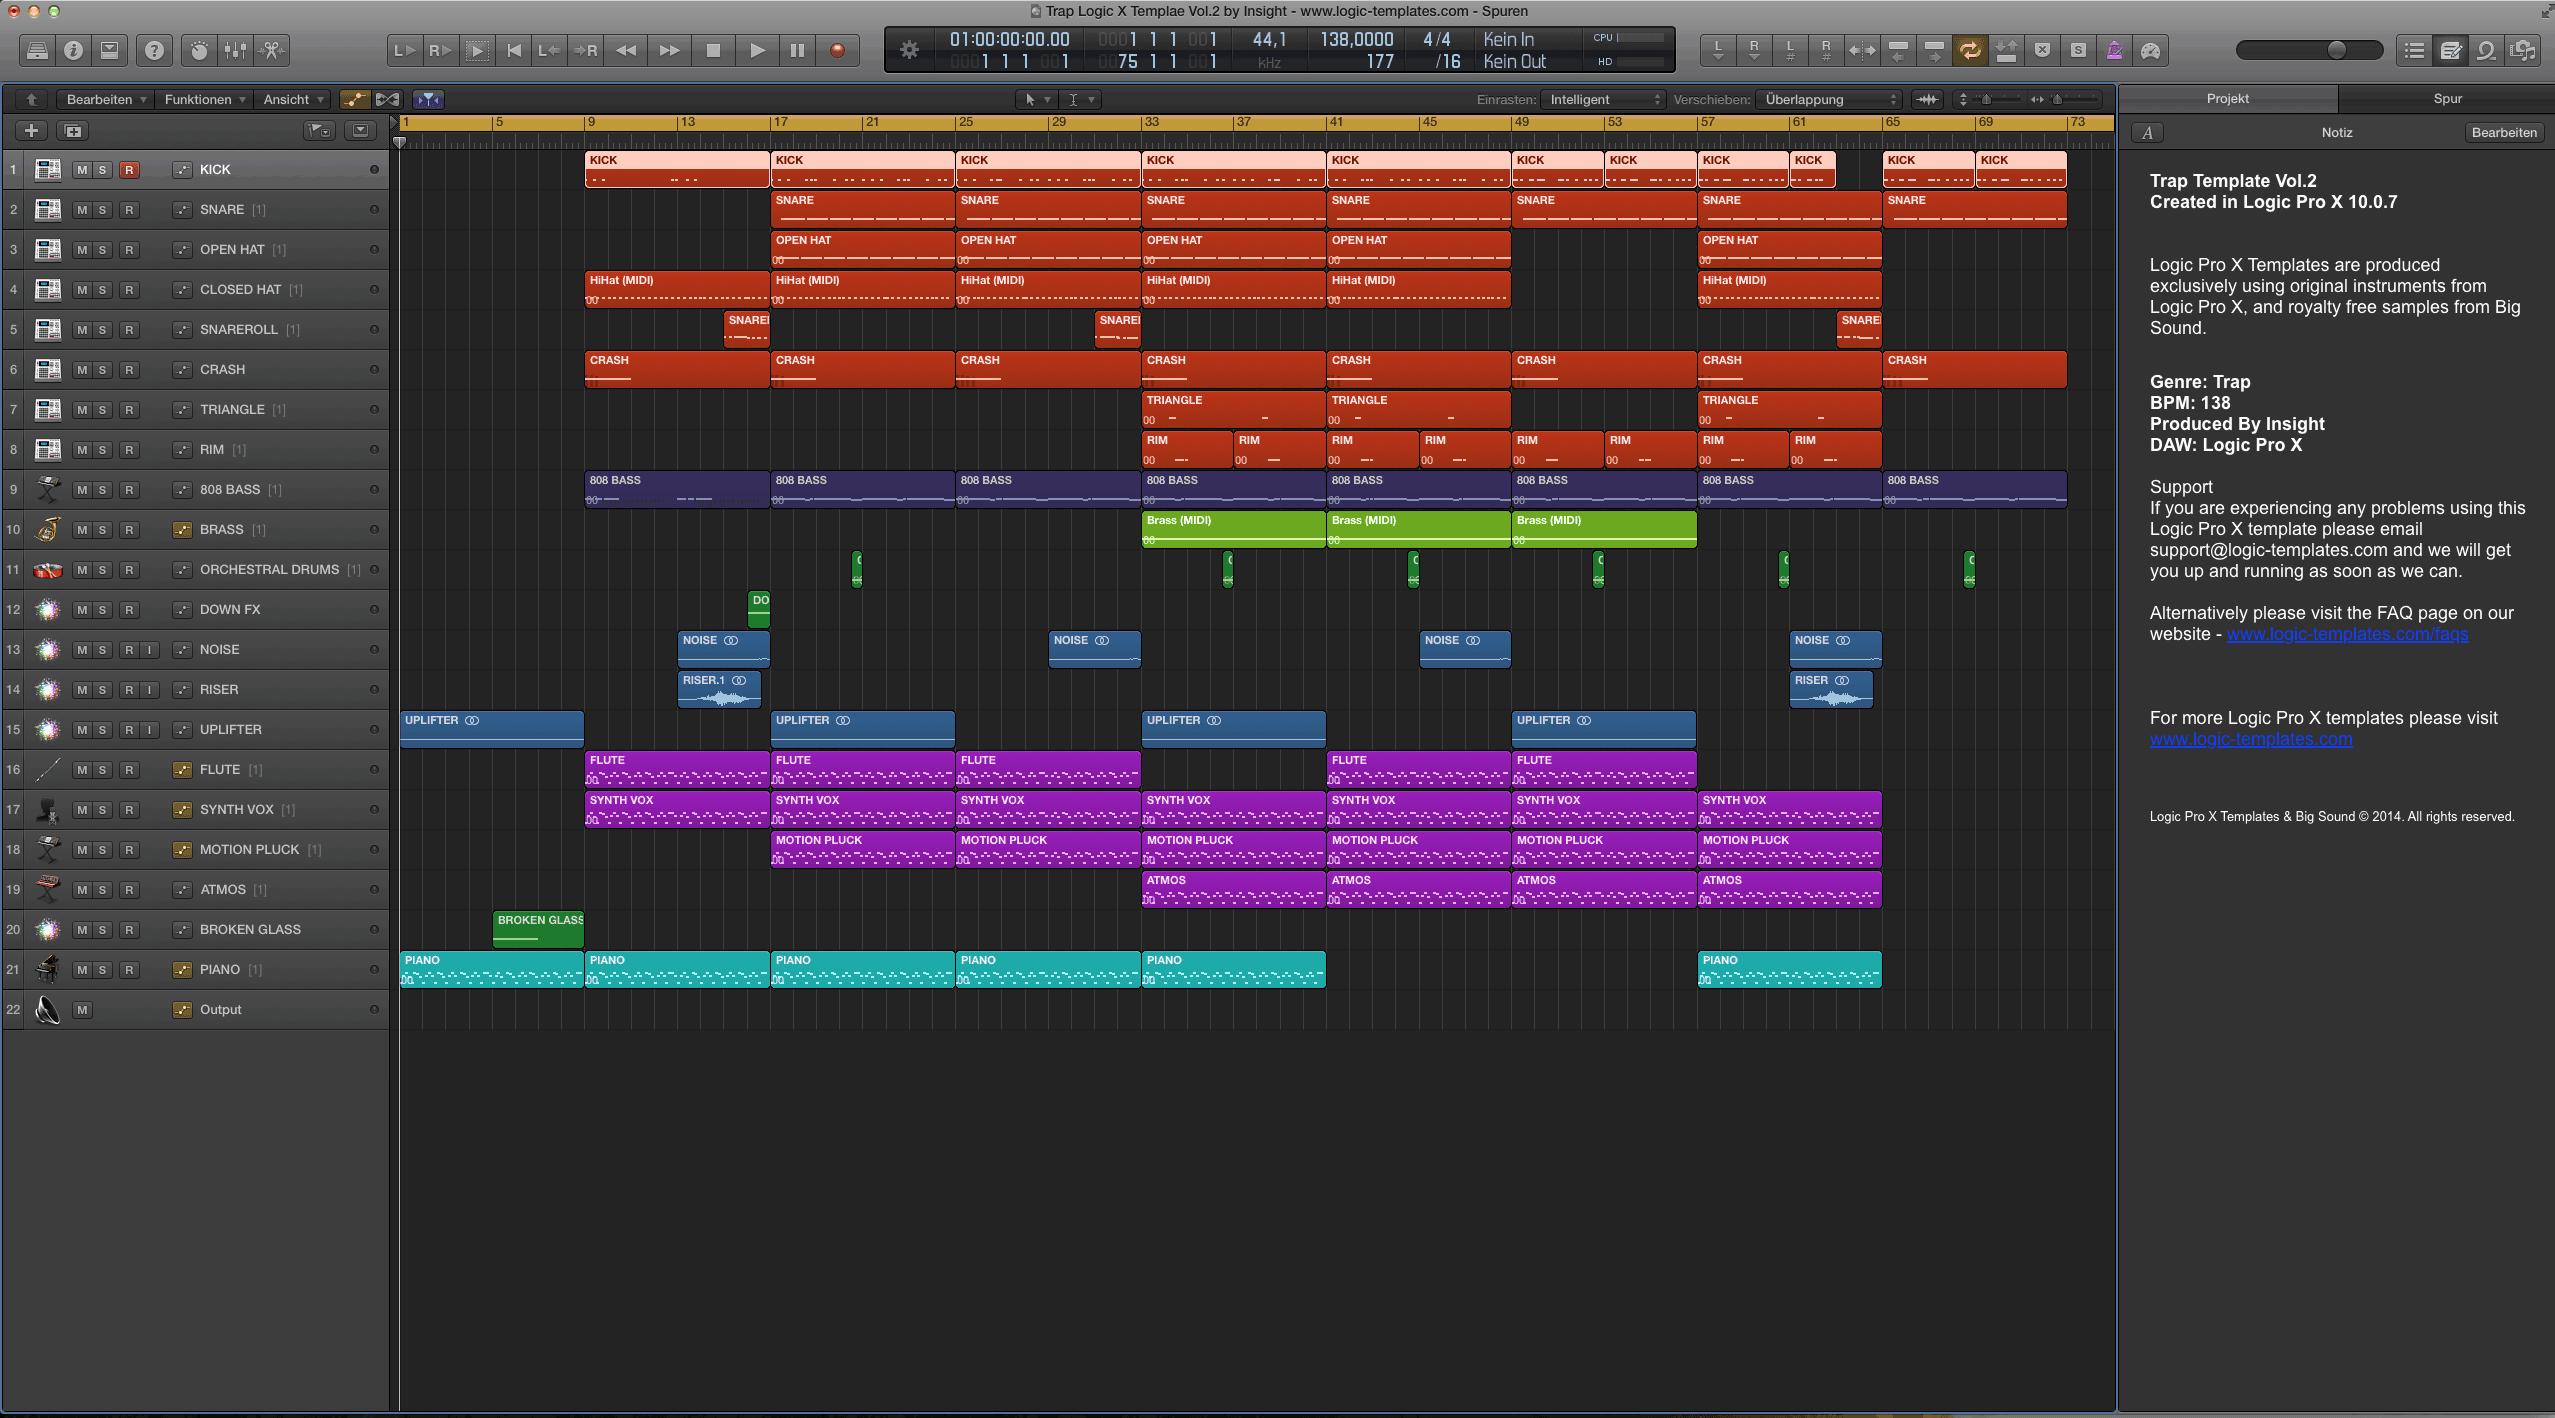 Trap Logic Pro X Templae Vol.2 by Insight